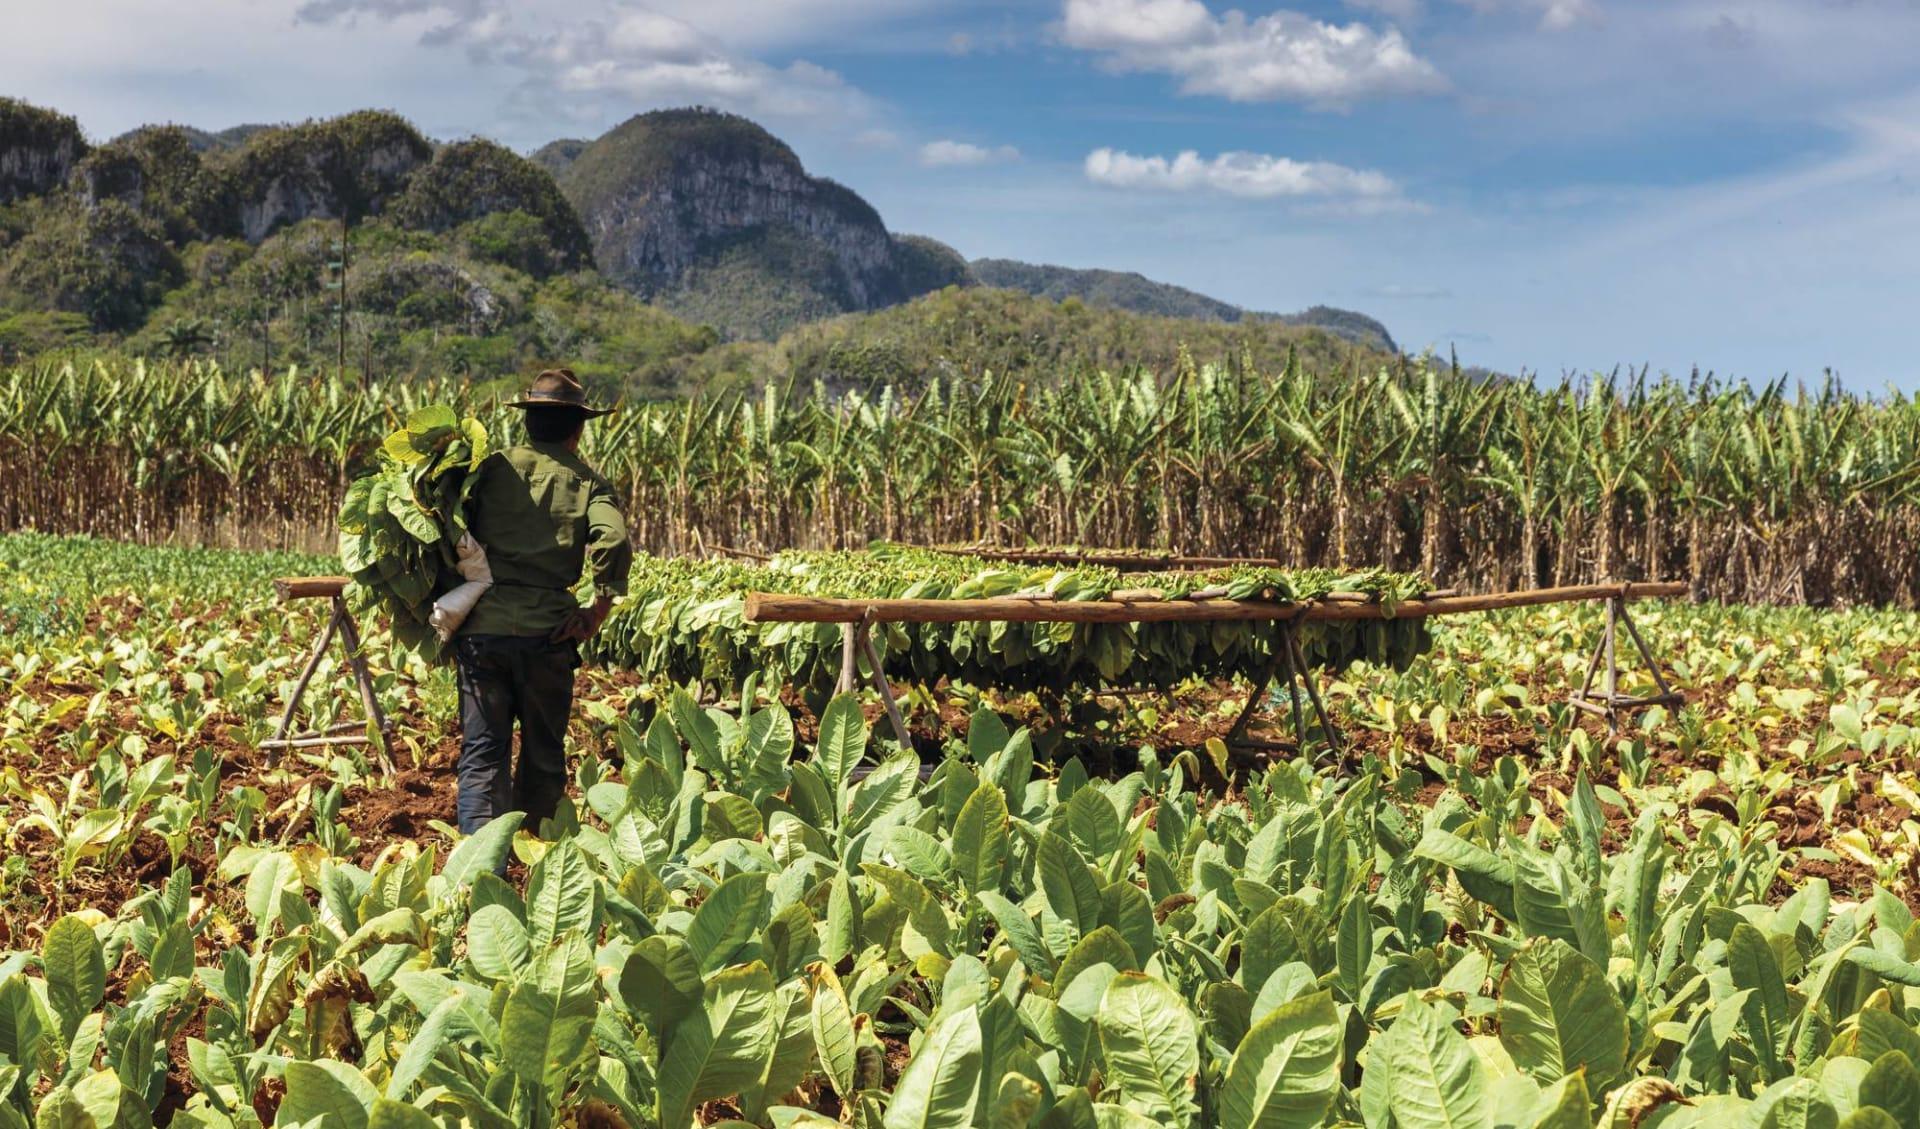 Cuba von West nach Ost ab Havanna: Natur Viñales - Kuba Tabakfeld mit Mann C